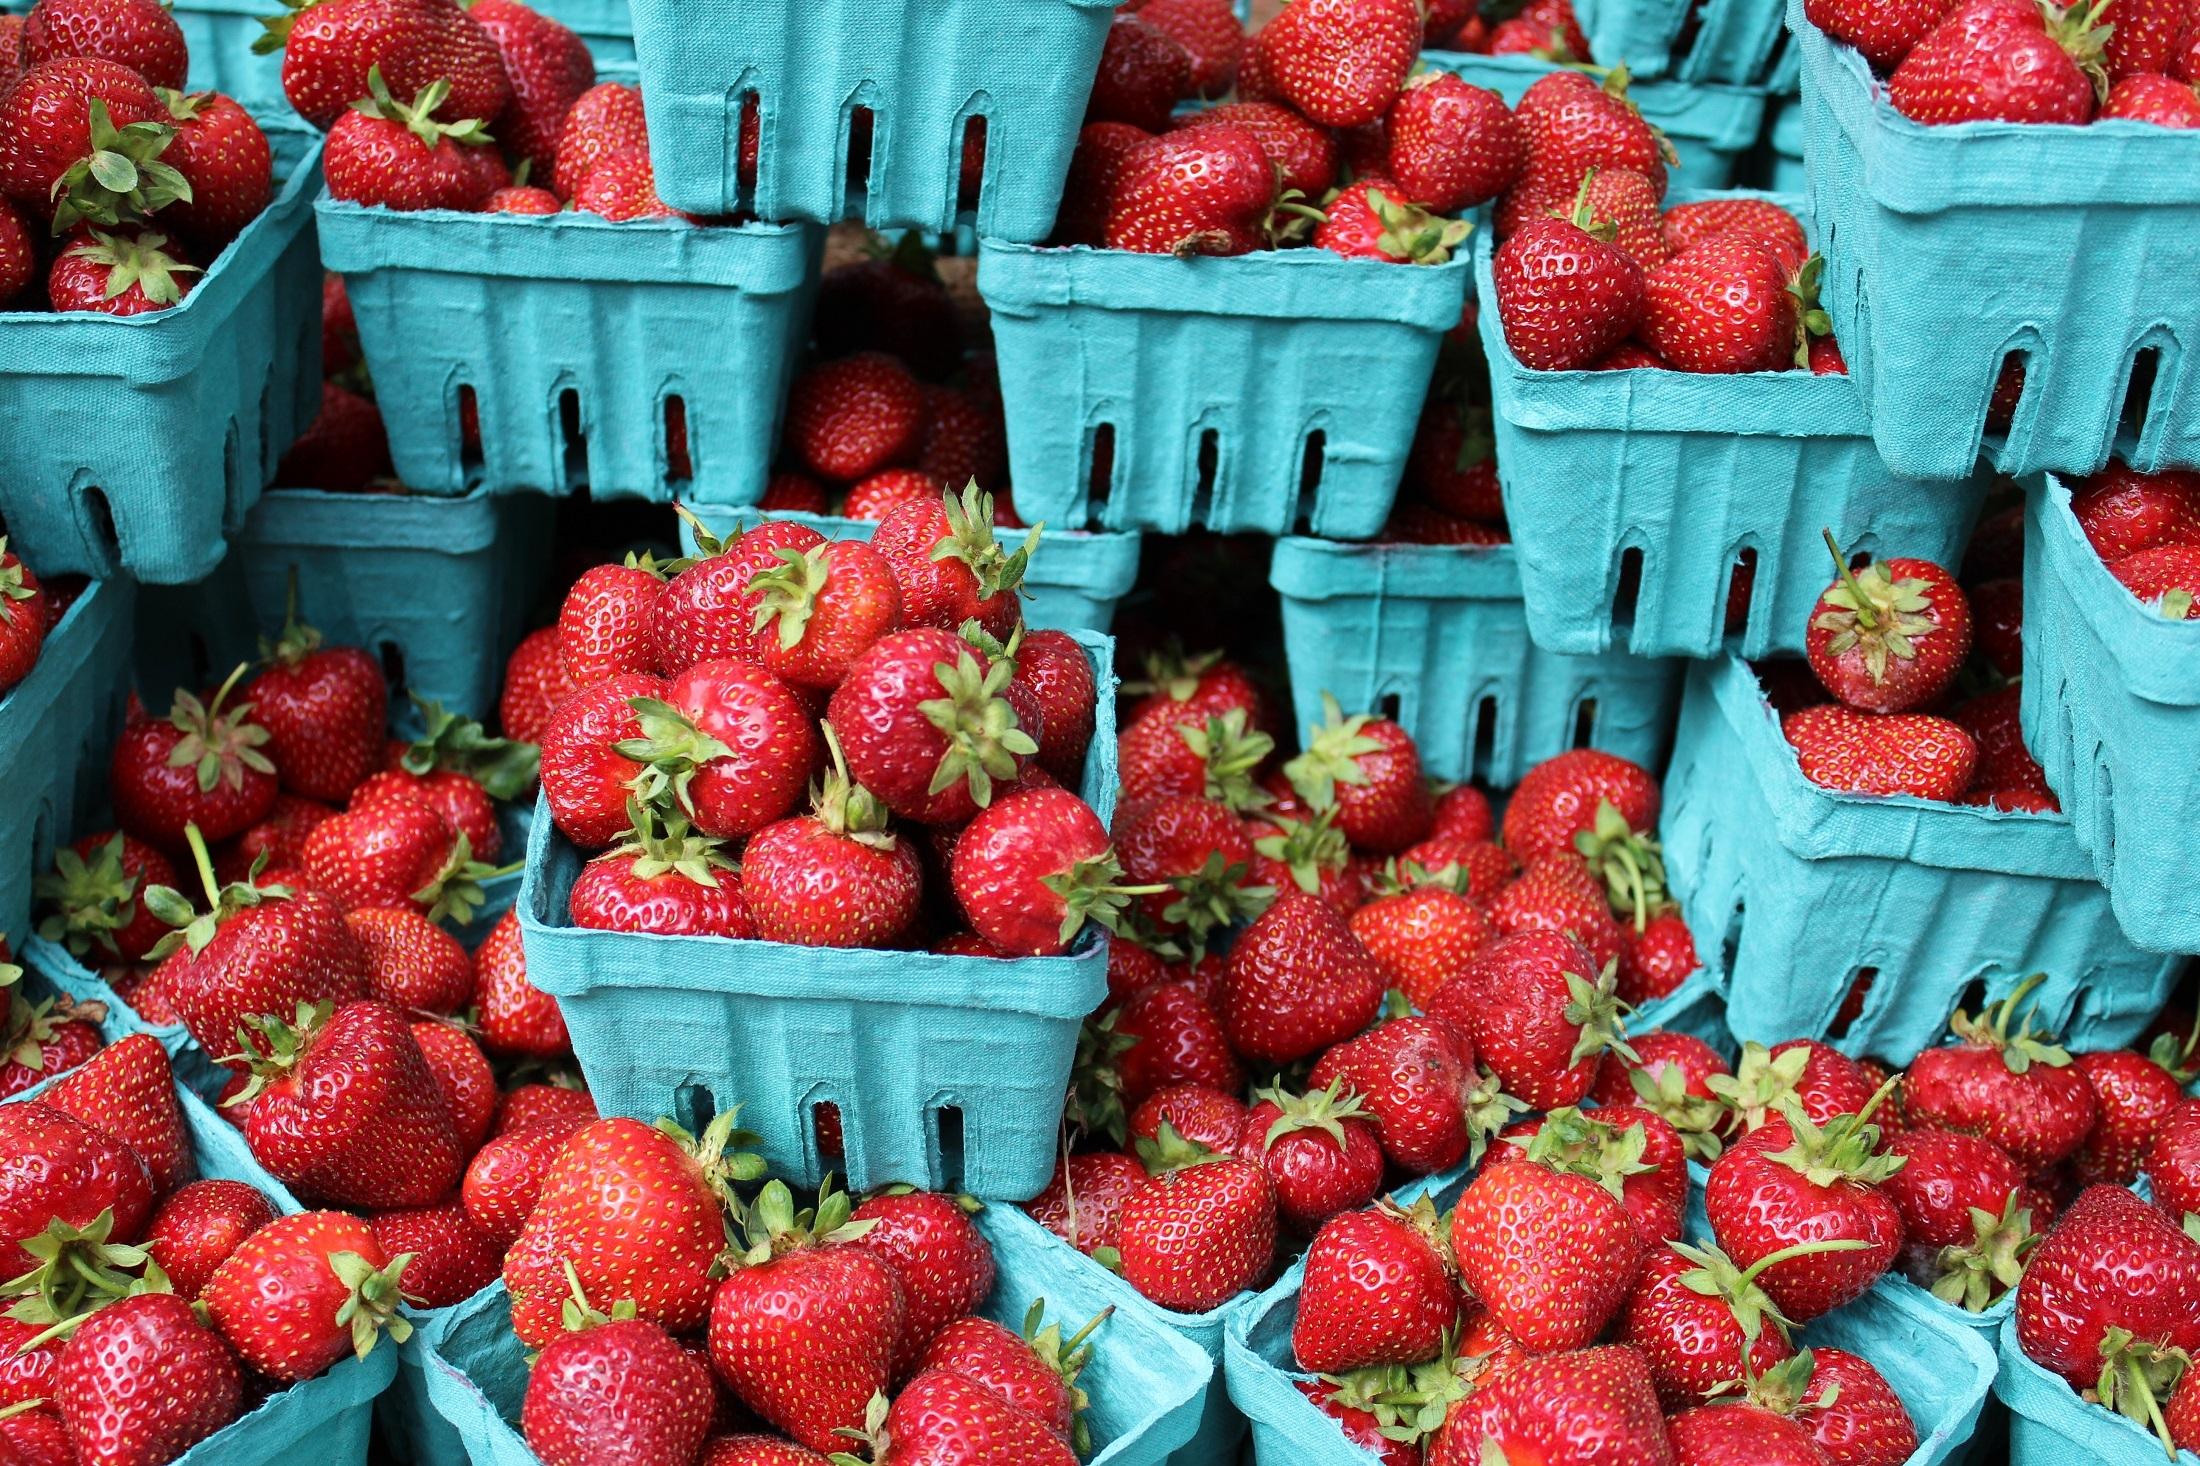 menanam buah matang makanan merah panen bahan menghasilkan tanaman segar pasar pasar warna warni berair